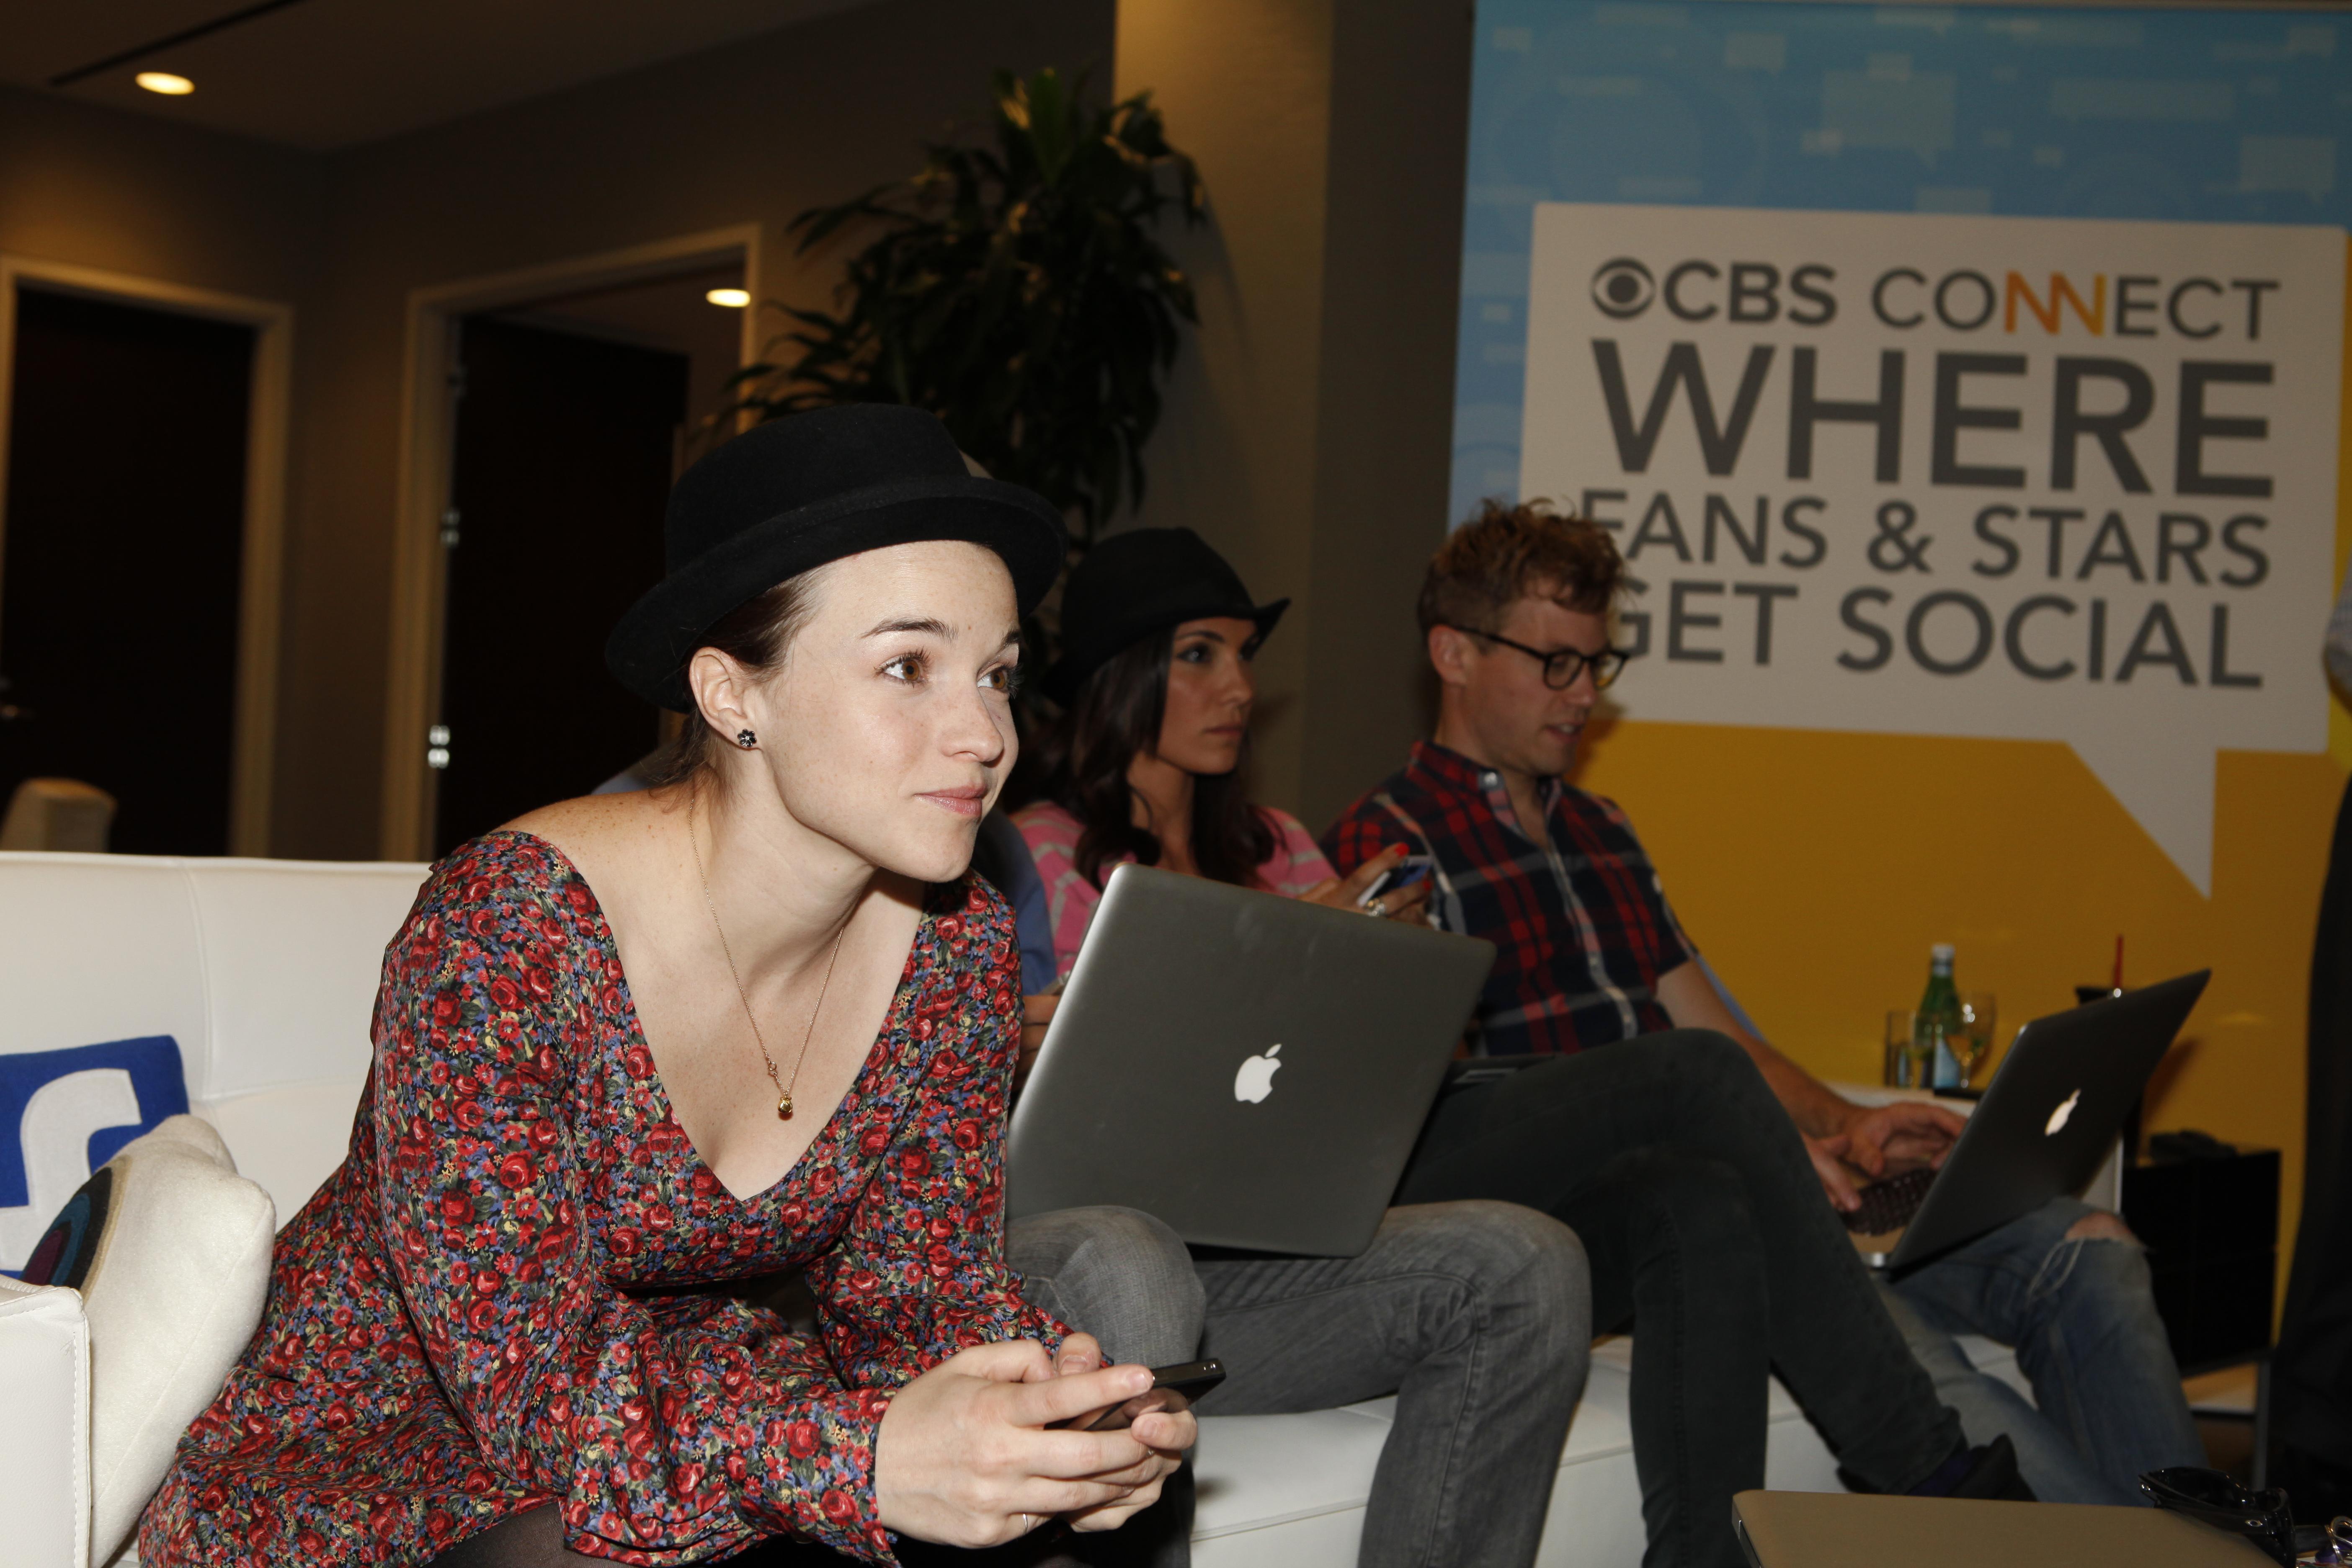 NCIS: Los Angeles' Renee Felice Smith